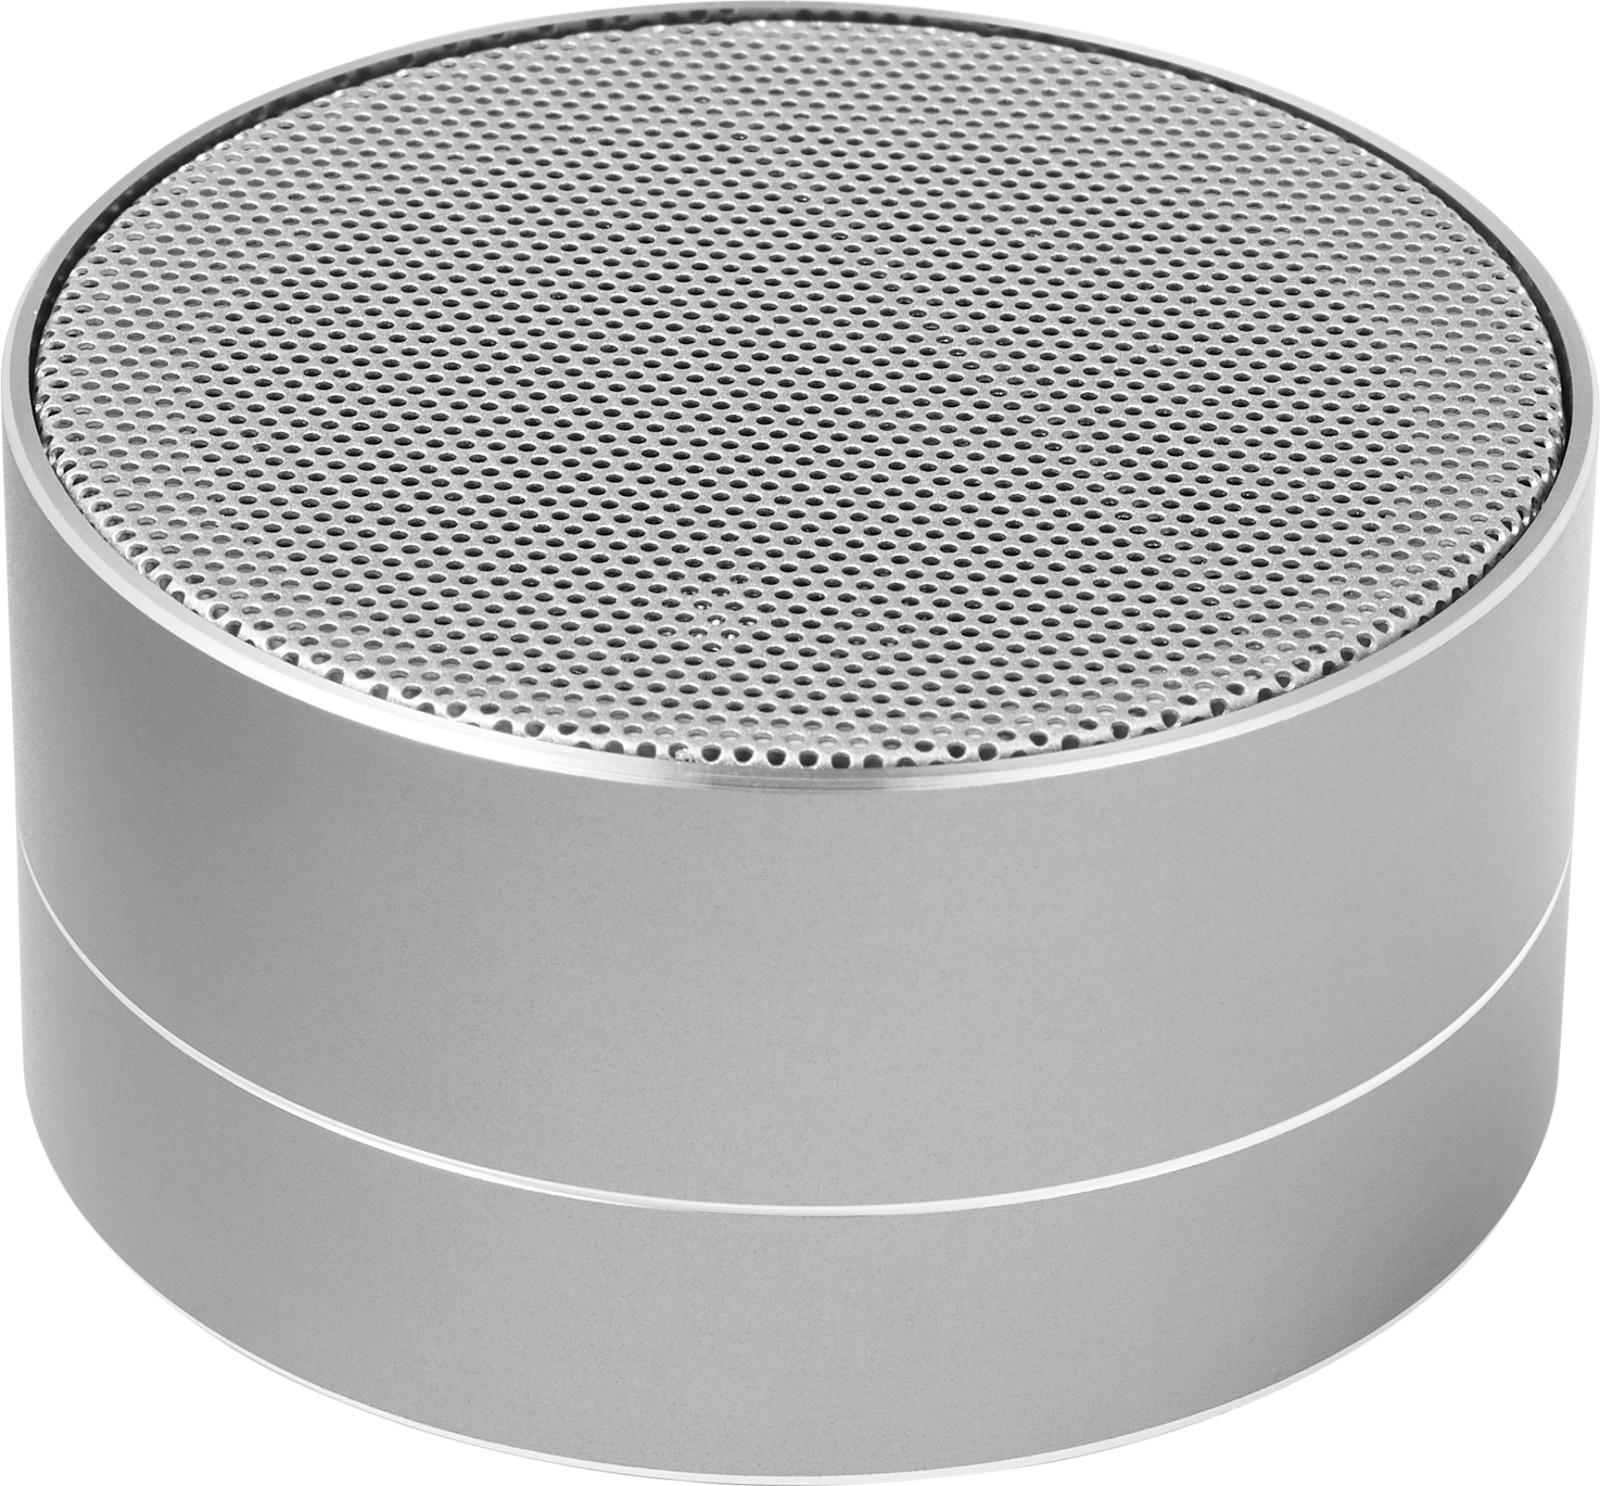 Aluminium wireless speaker - Silver